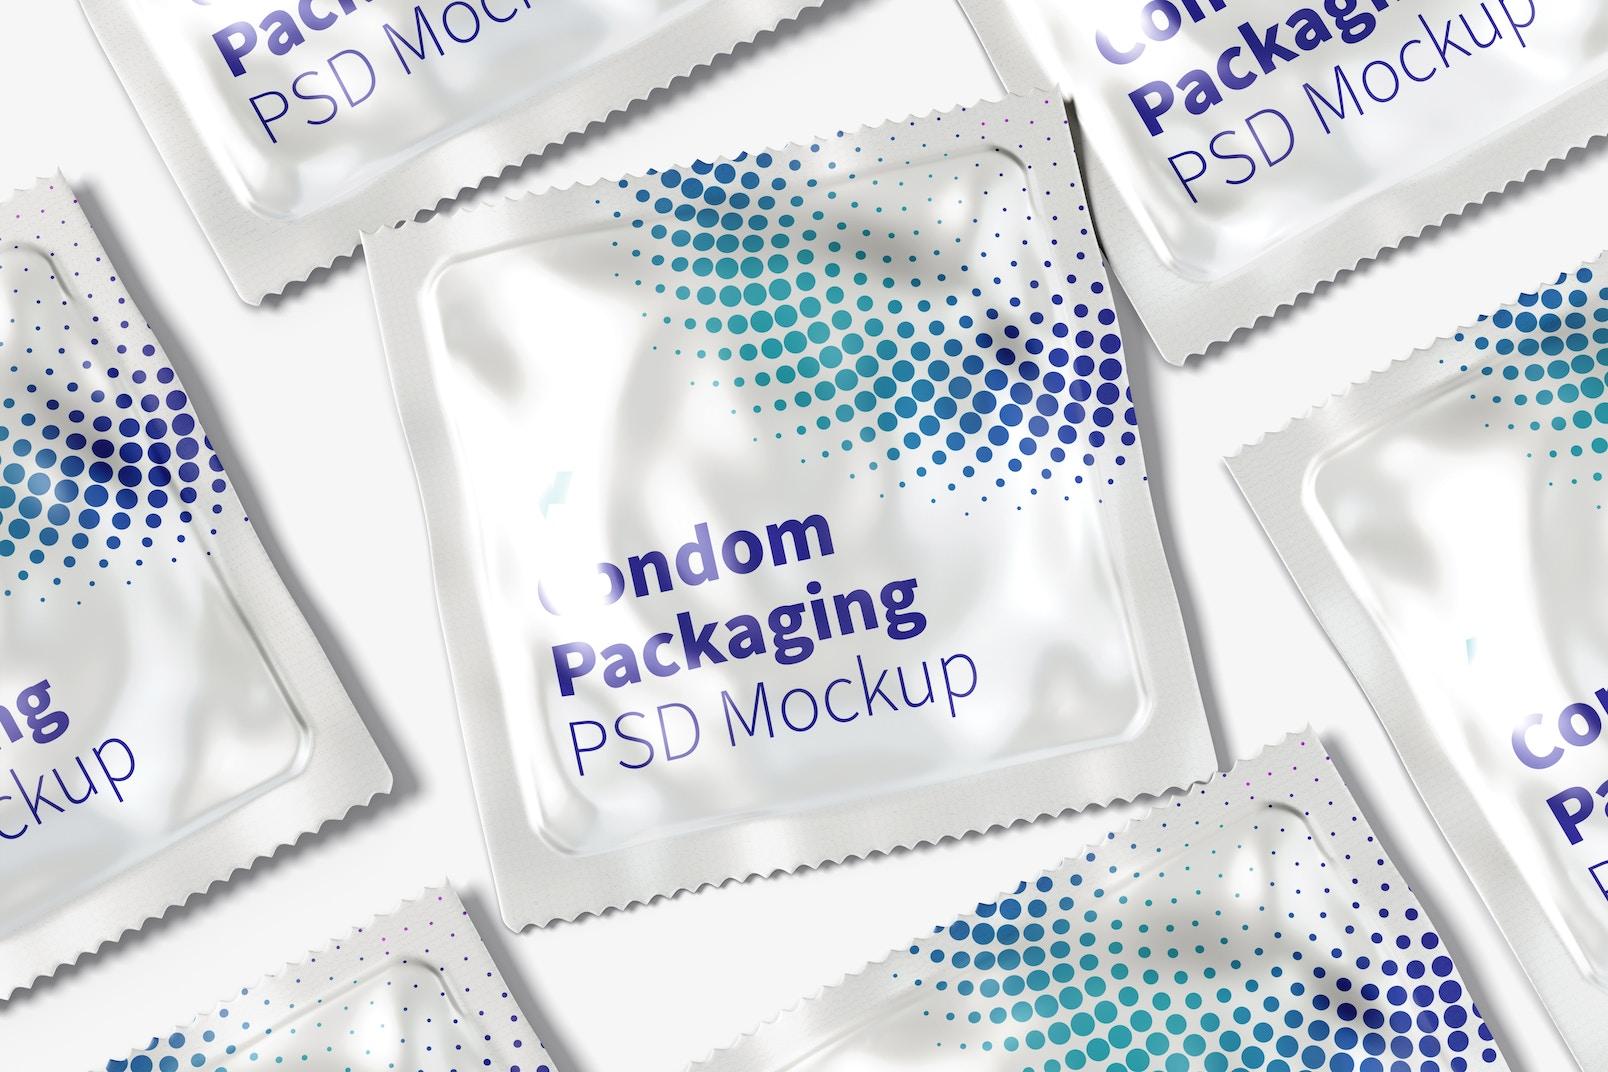 Condom Packaging Mockup, Close Up